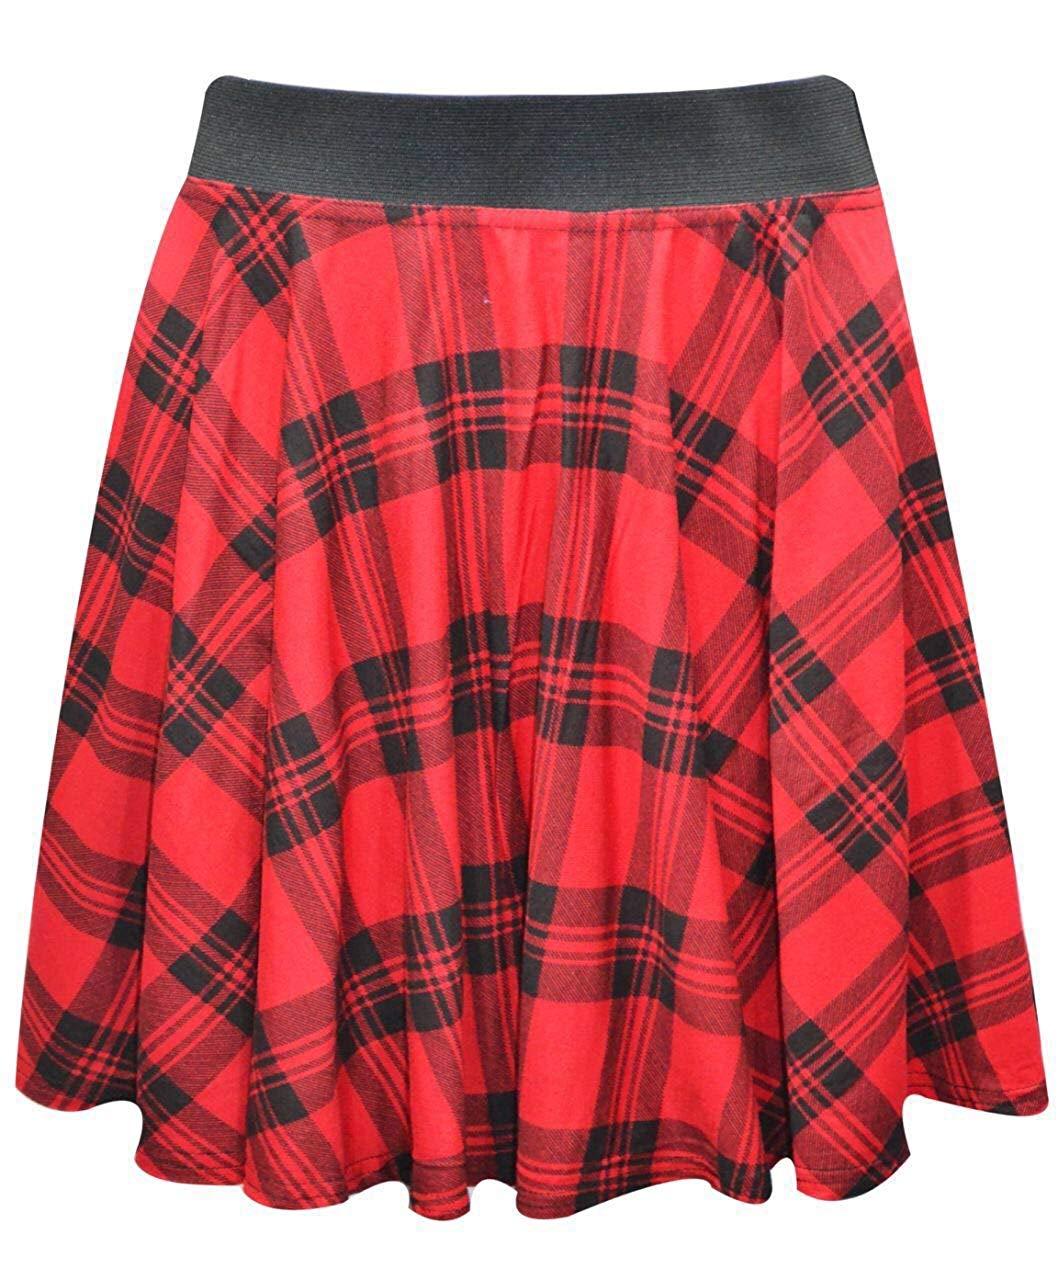 aae7ad73a5 Get Quotations · Women's Red Tartan Printed Elastic Waistband Short Mini  Skater Skirt